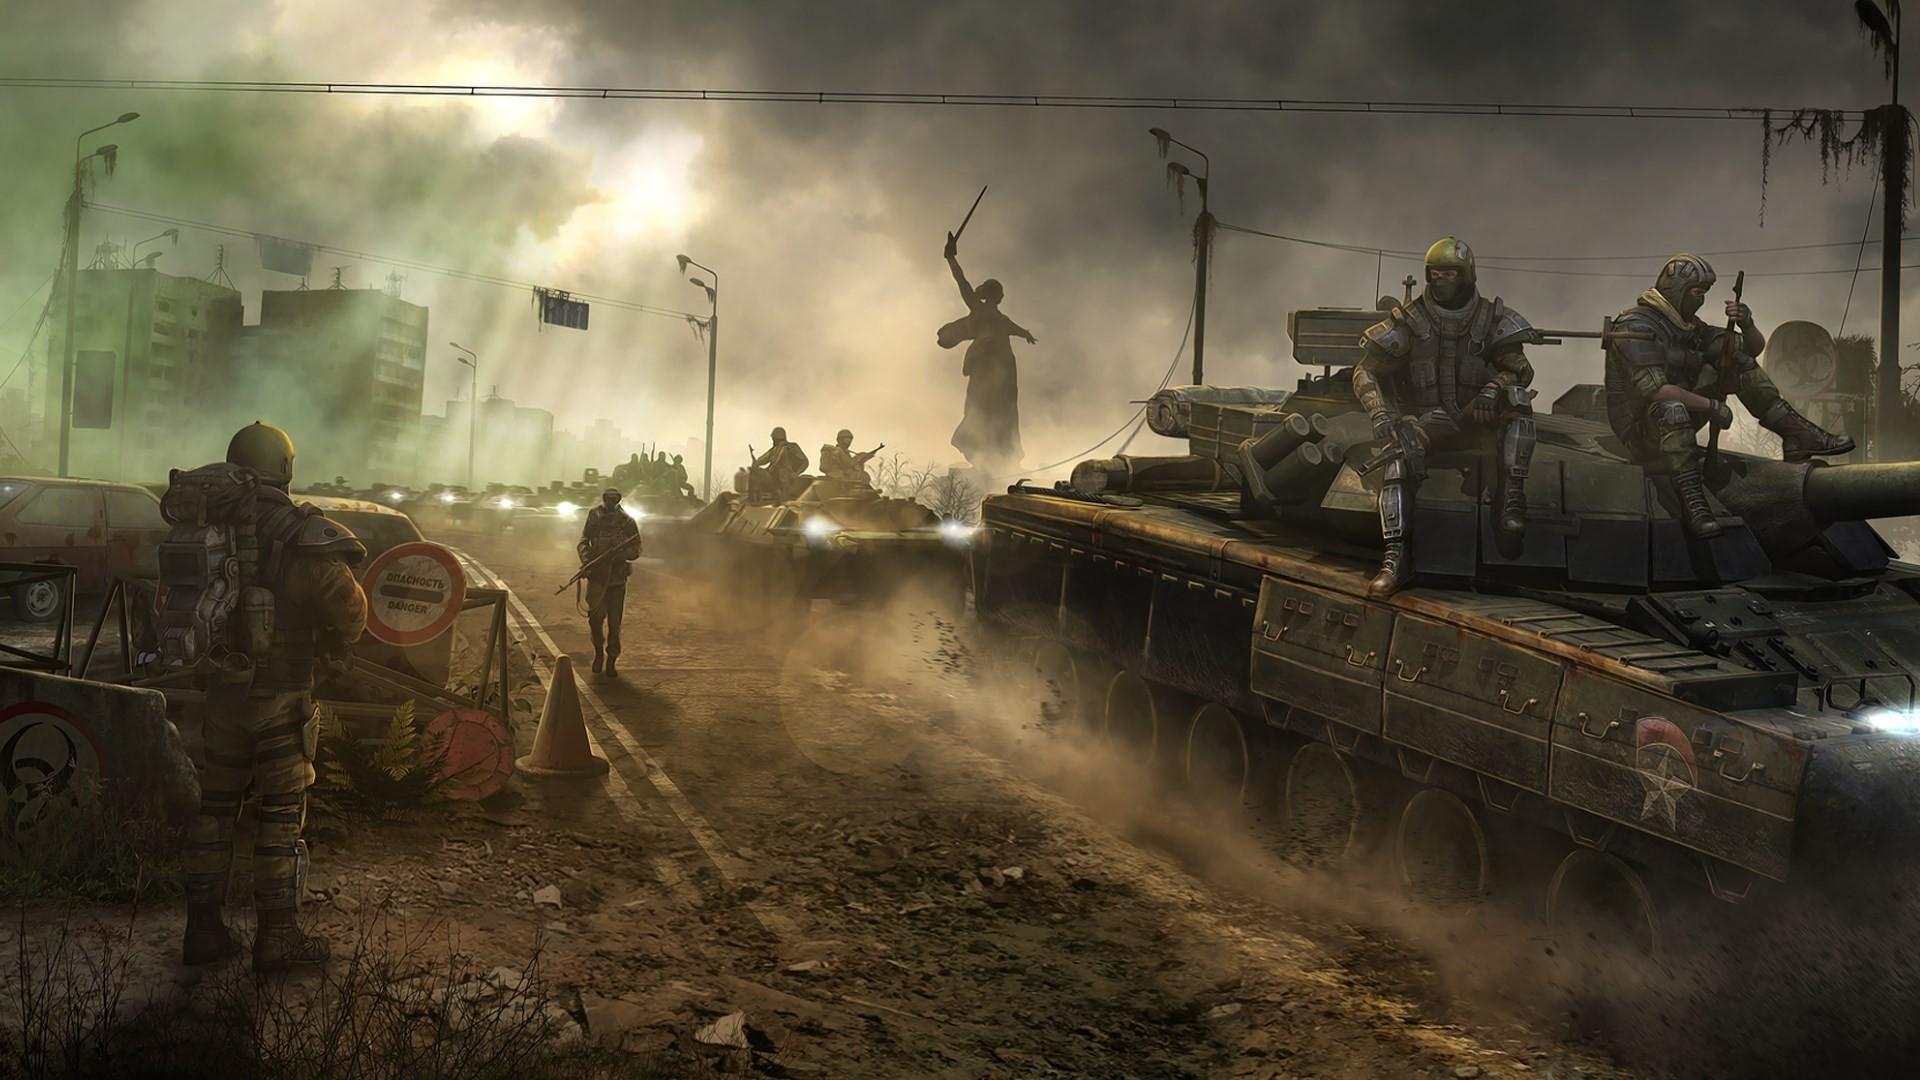 Post Apocalyptic Wallpapers April 2014 6 Survarium Apocalypse Tanks 1920x1080